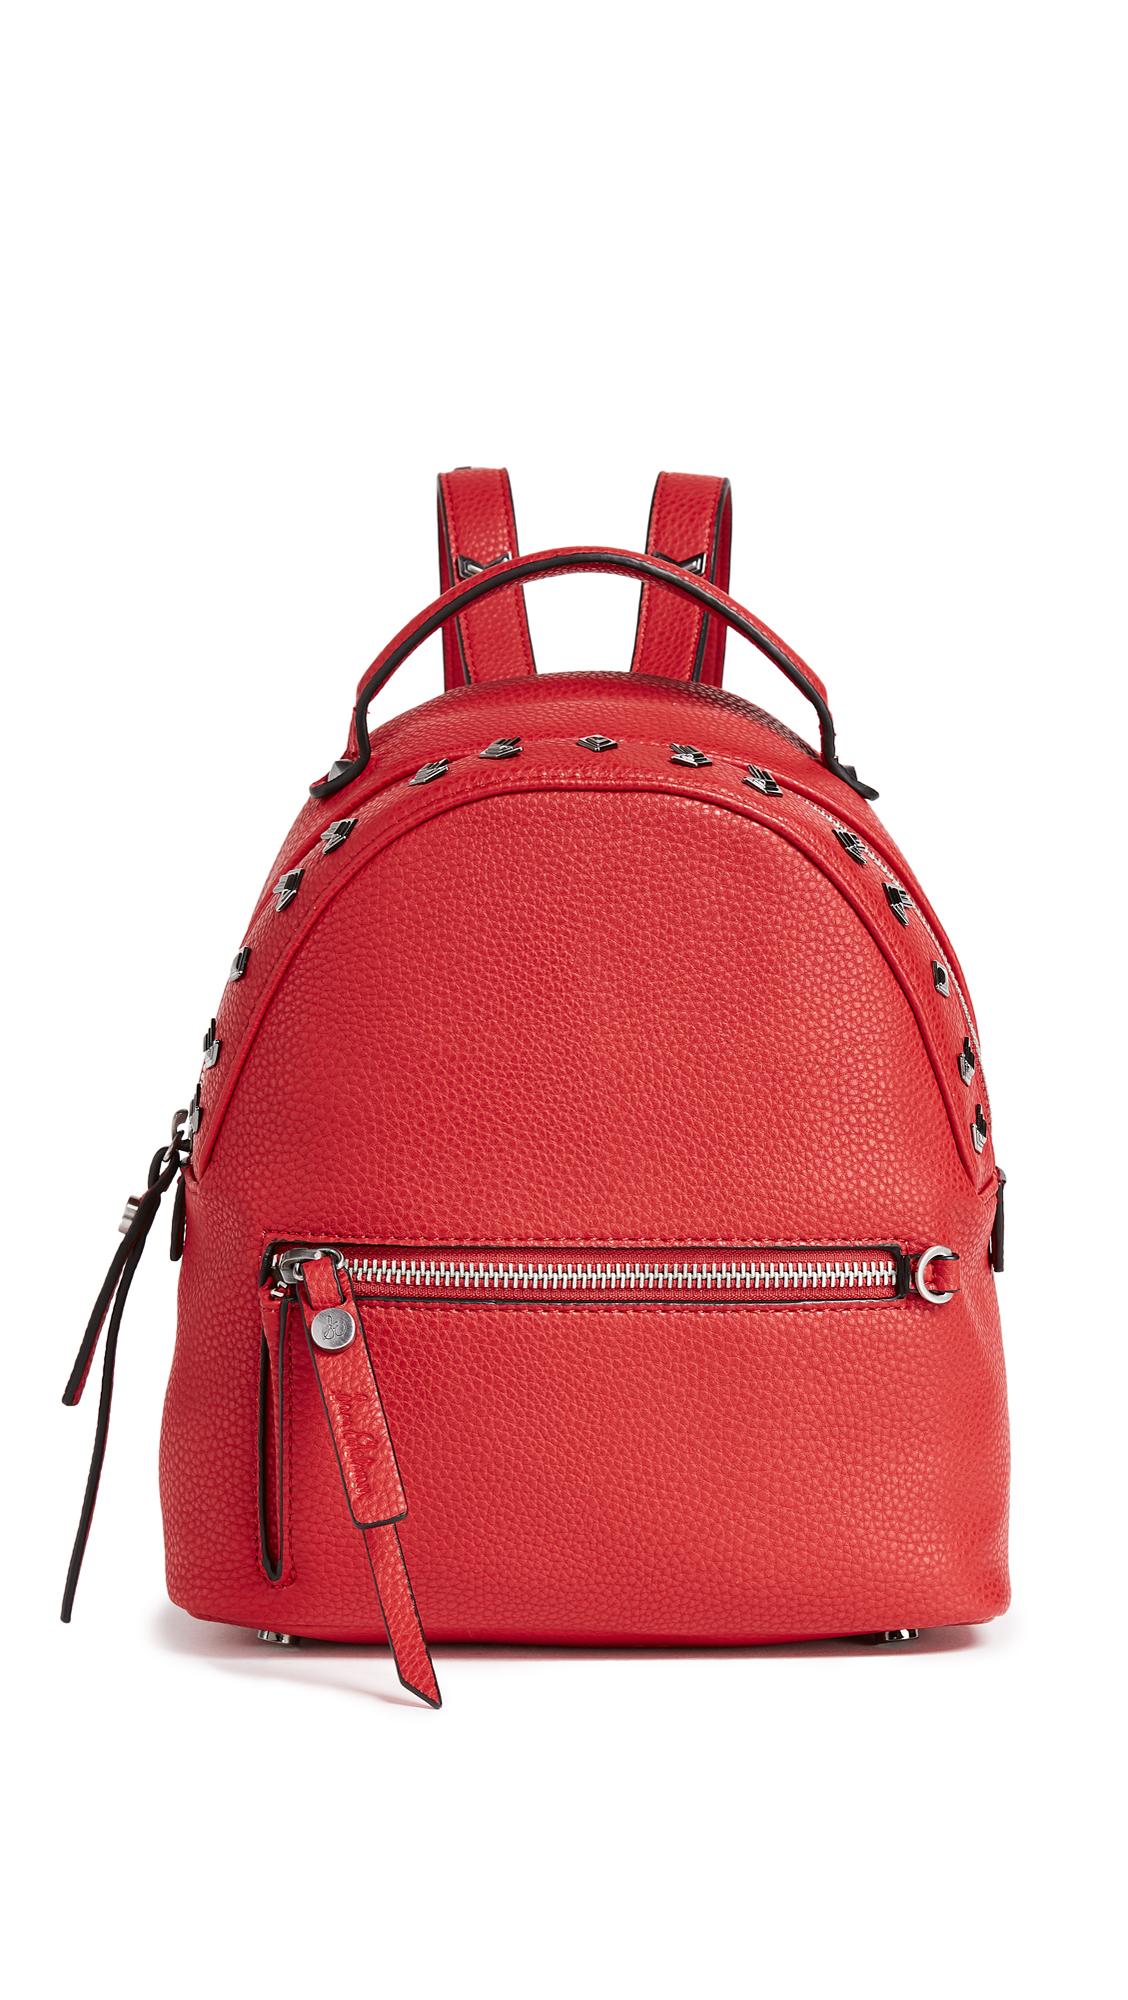 bc8578c6572f9 Sam Edelman Sammi Studded Mini Backpack